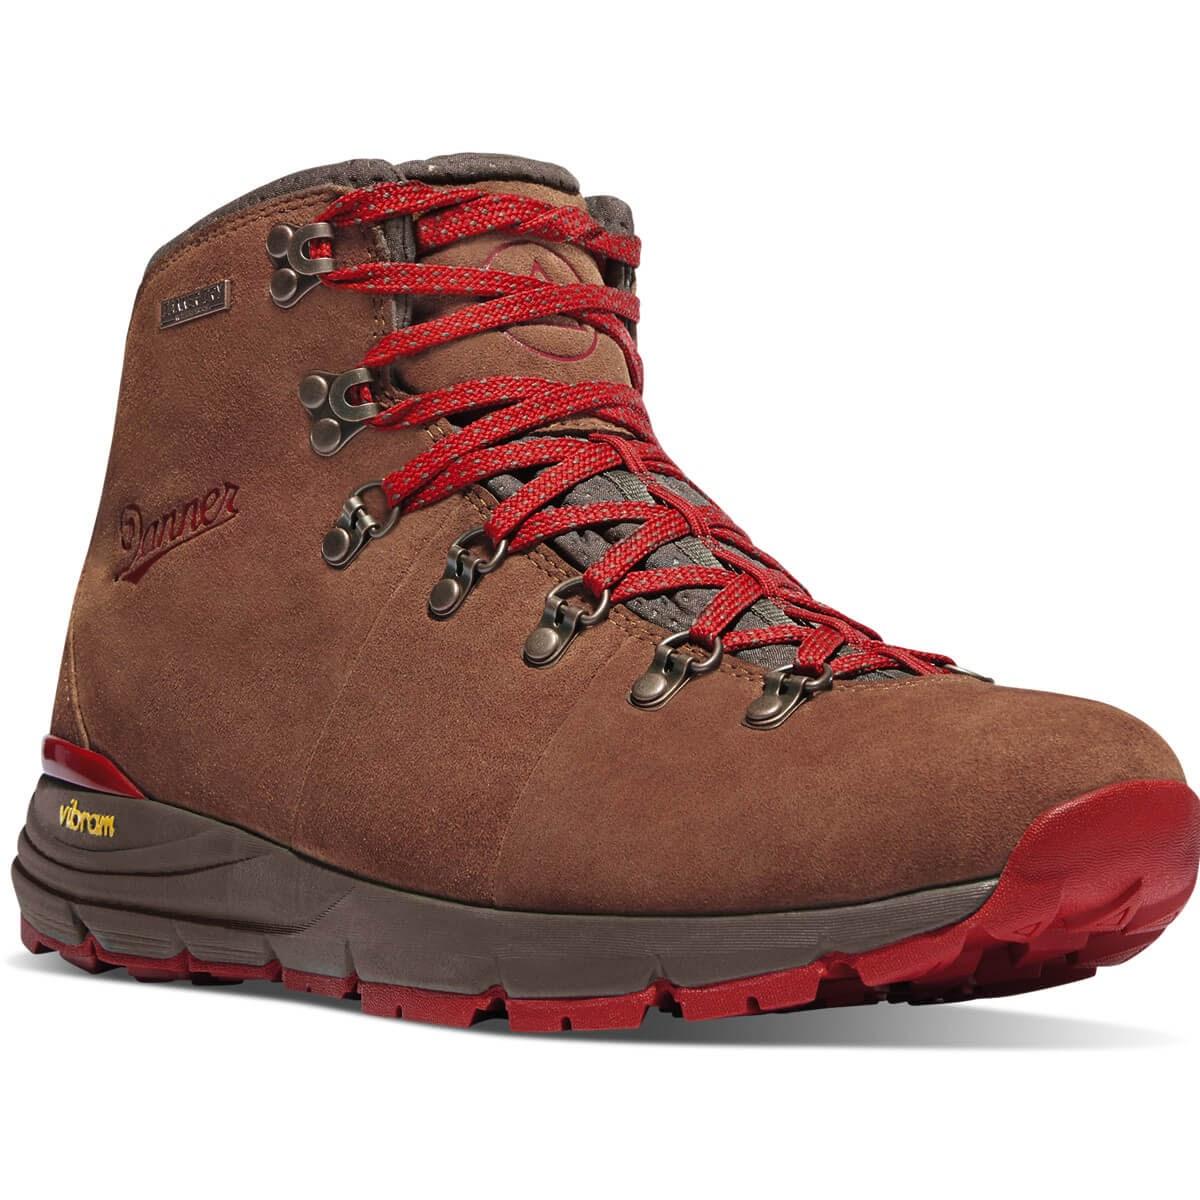 Danner Mountain 600 Waterproof Hiking Boot